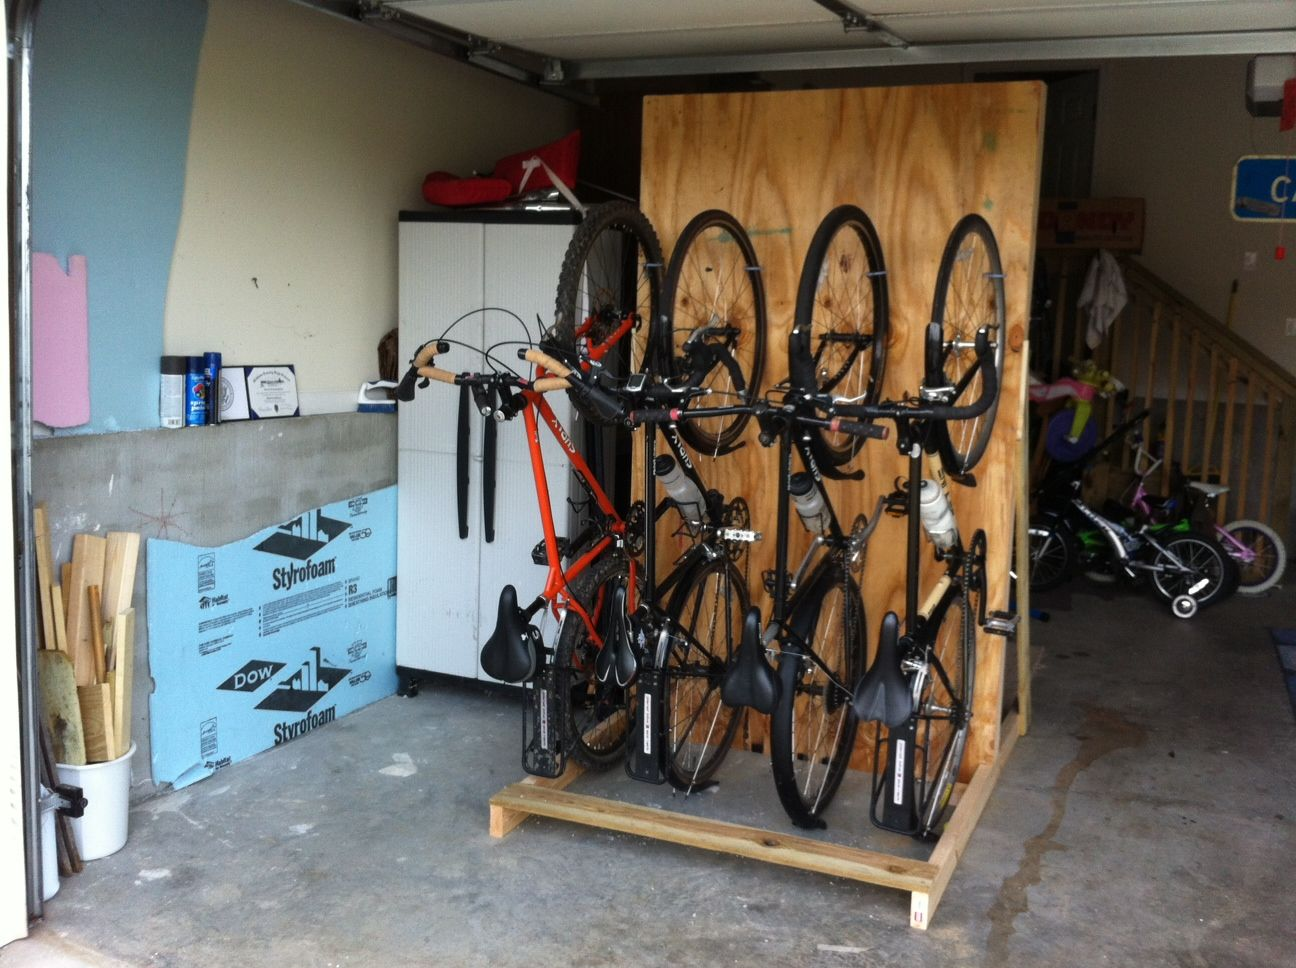 Family Bike Words Bike Parking Biking In 2019 Bike